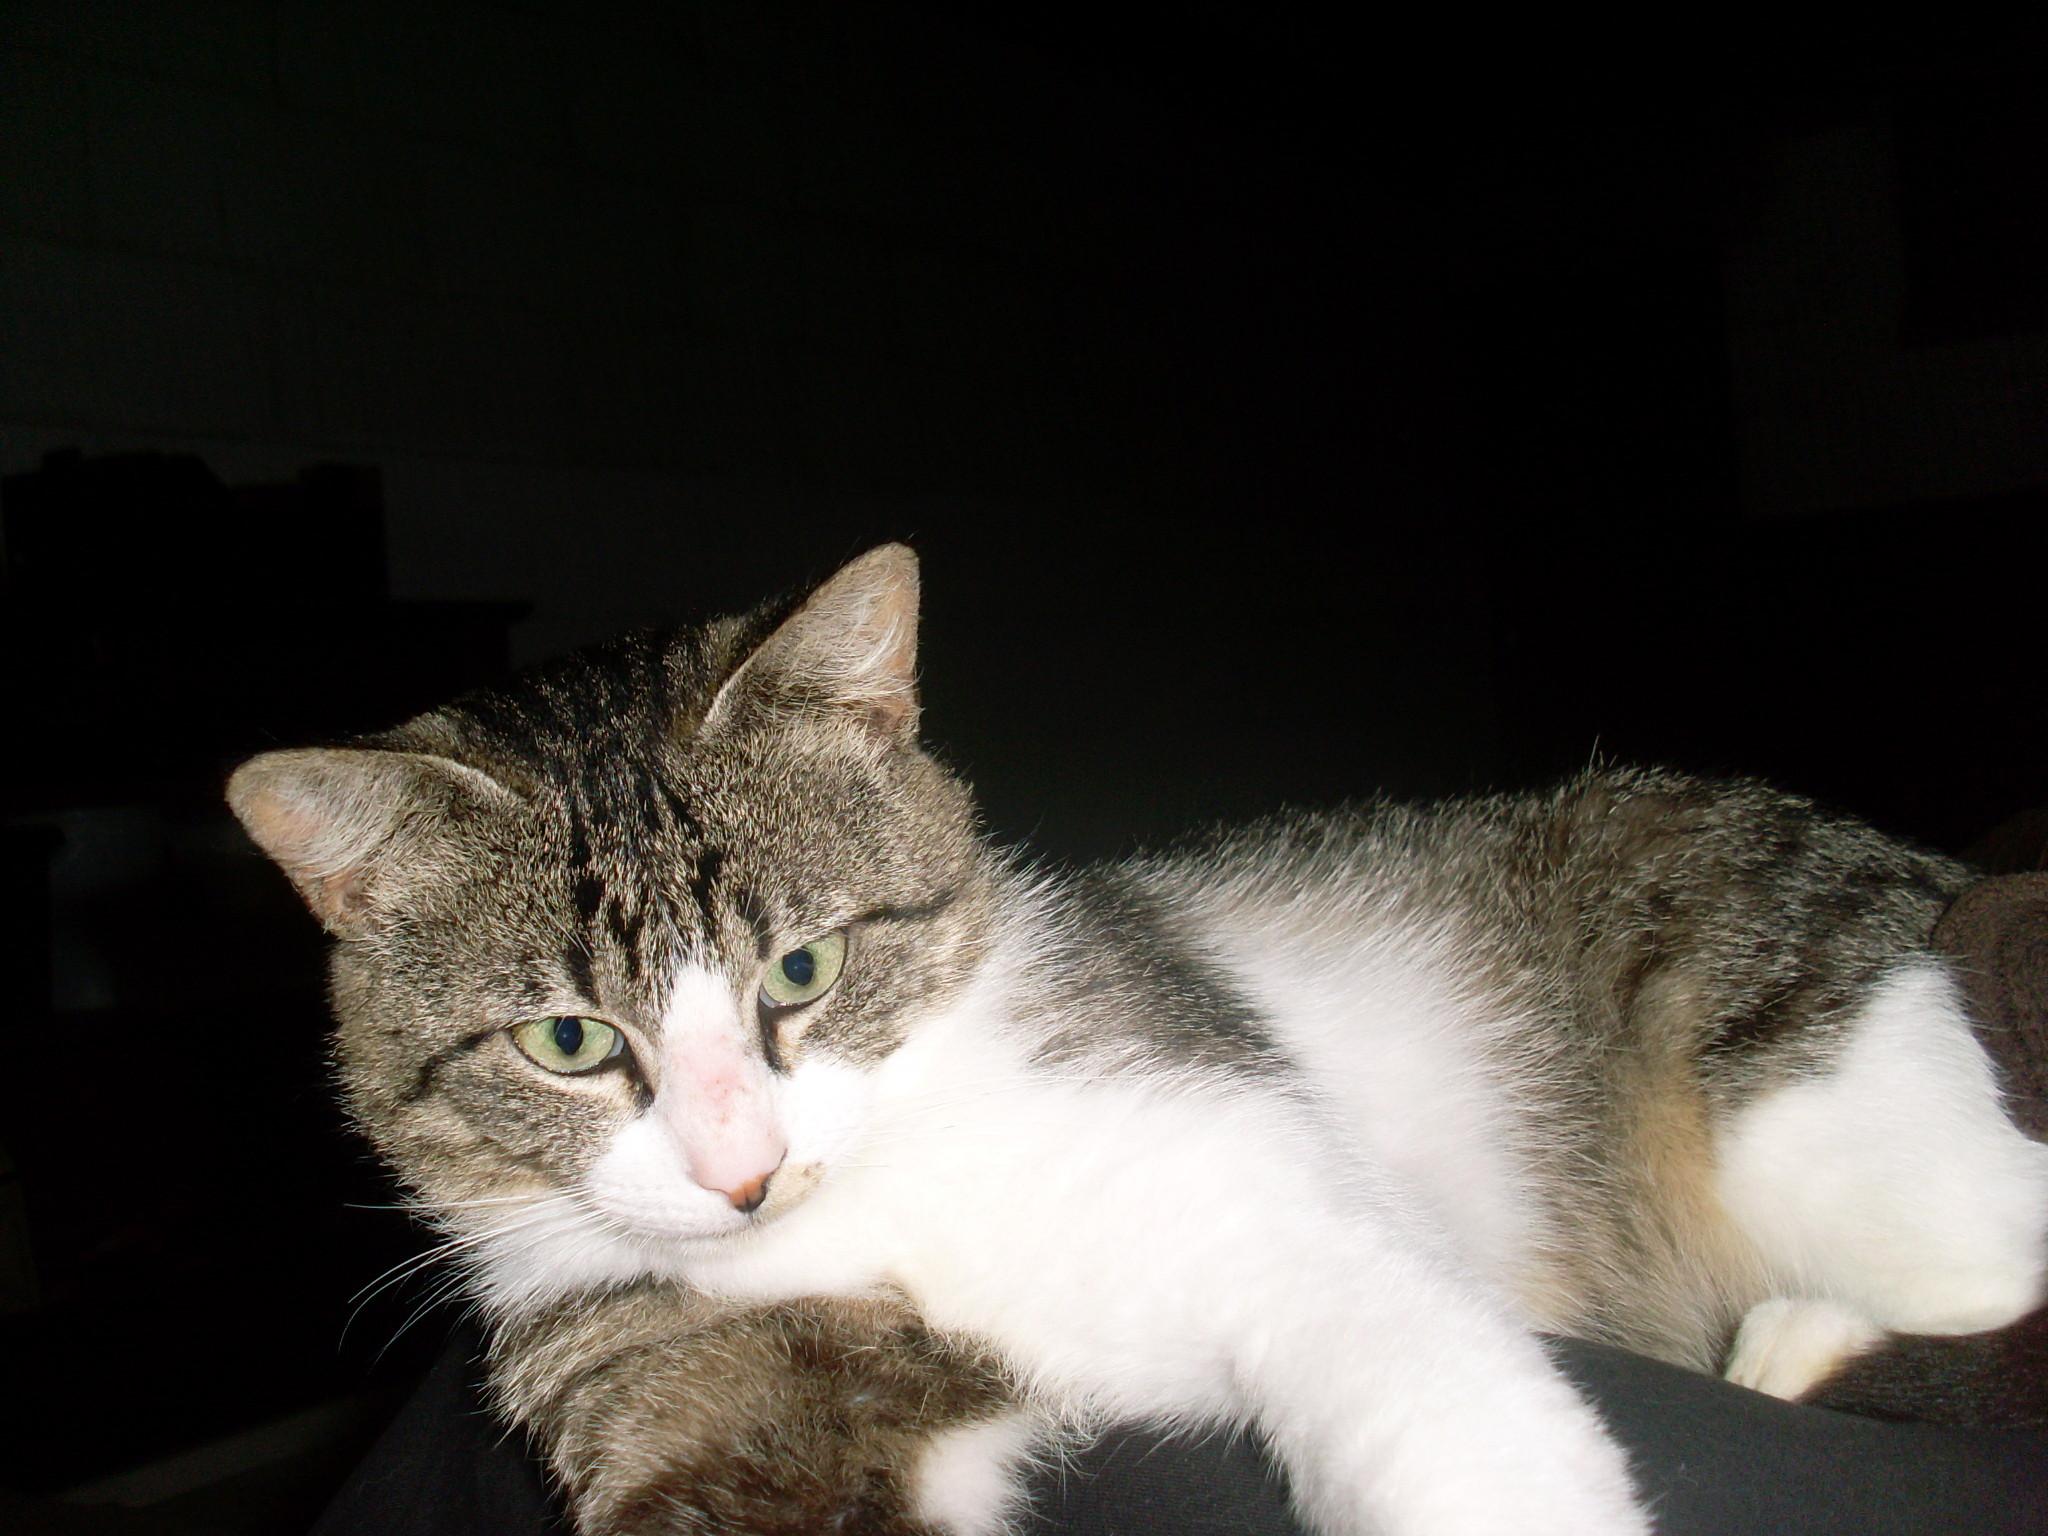 Ponko, mâle type européen tabby et blanc né 15 mai 2017 Sl370710